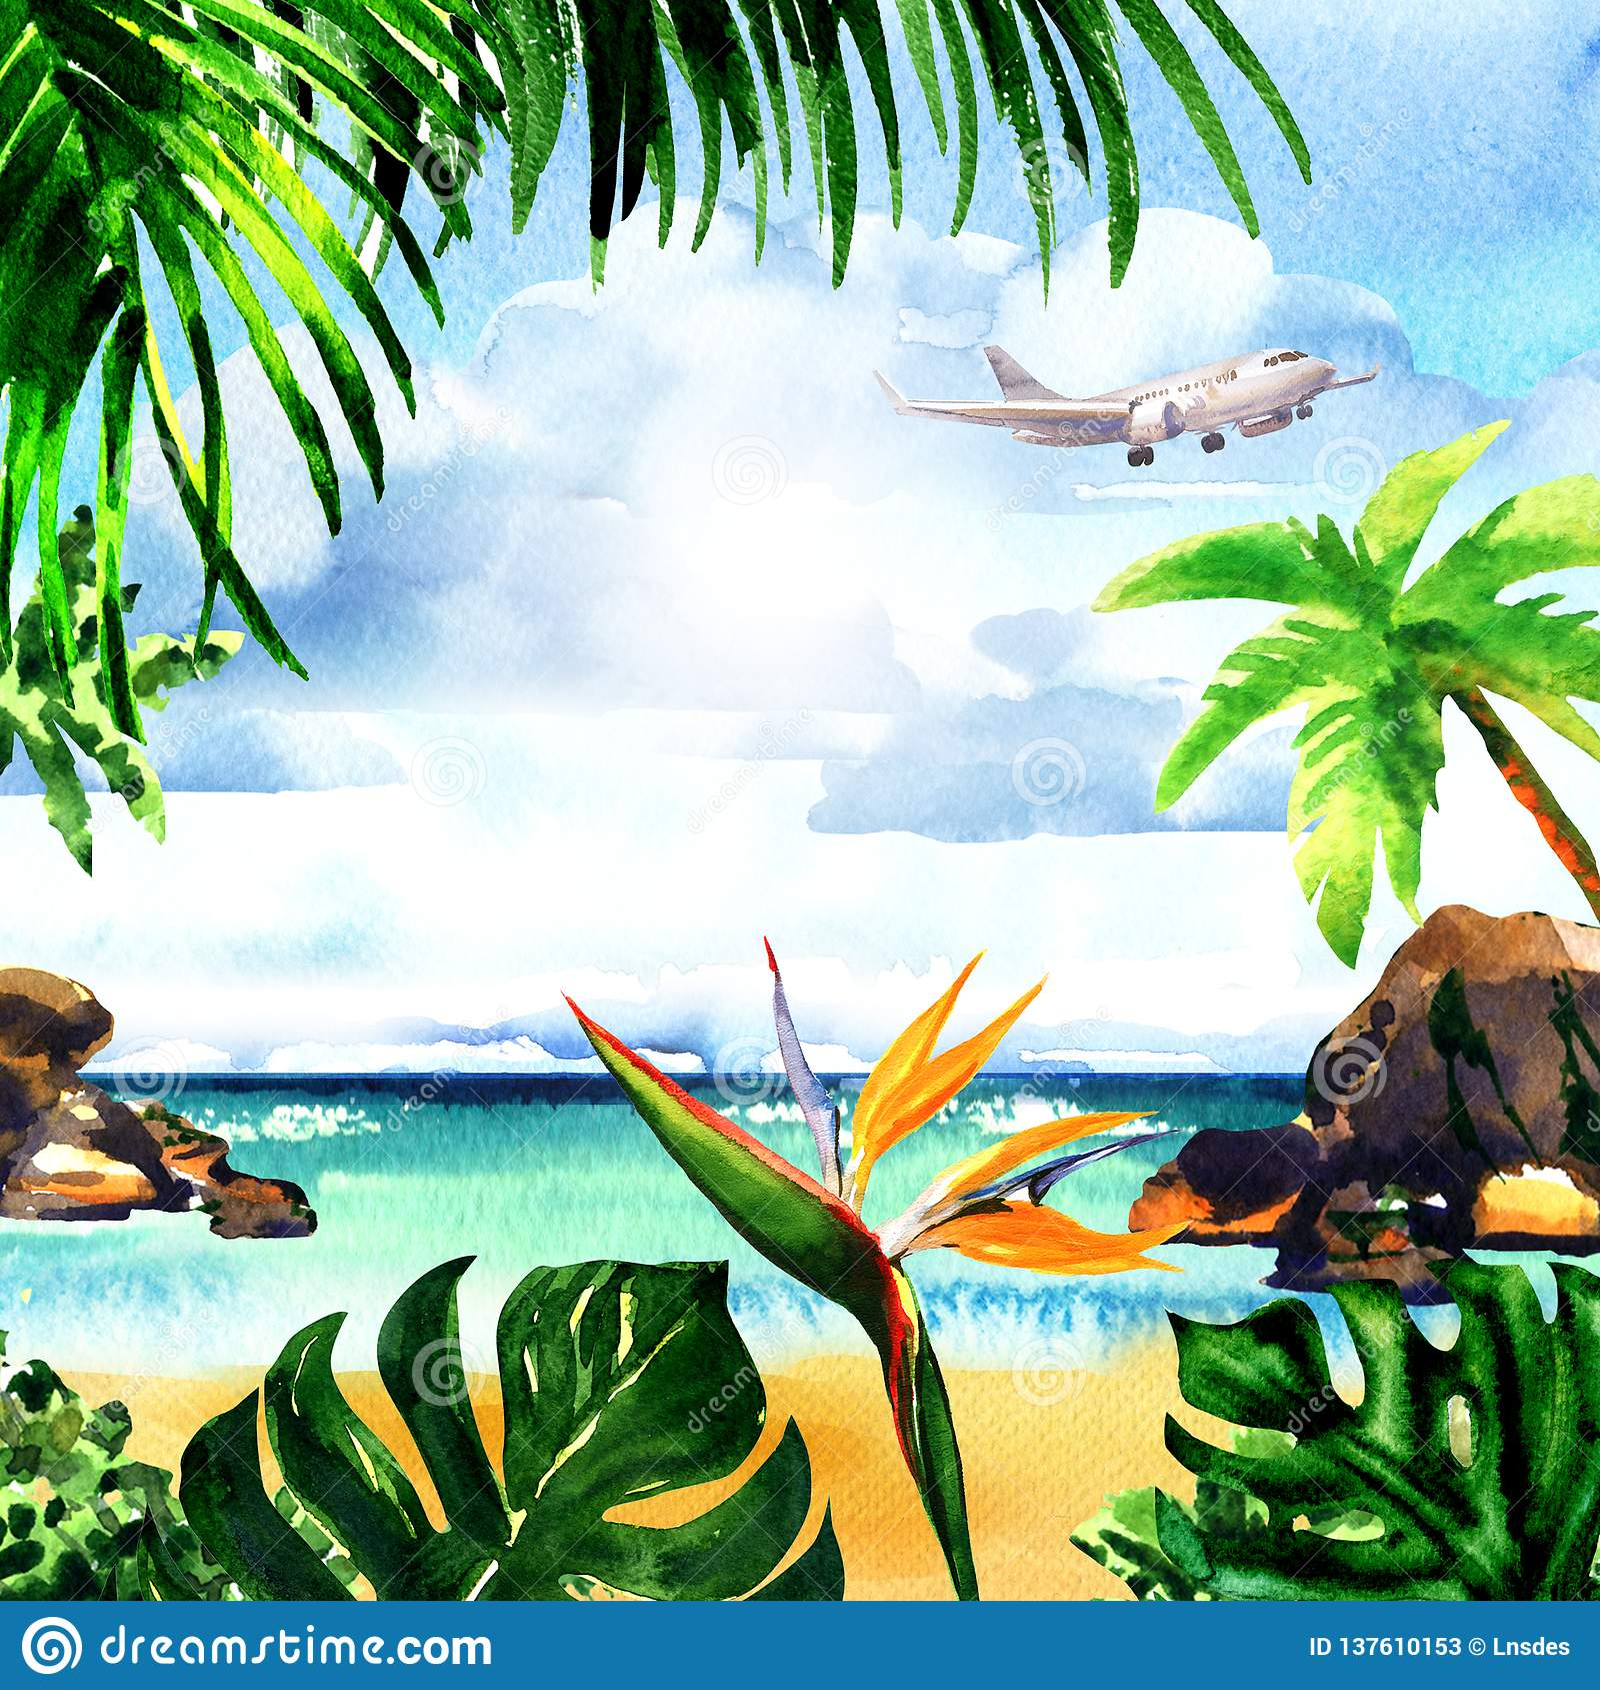 Tropical Island Paradise: Beautiful Paradise Tropical Island With Sandy Beach, Palm